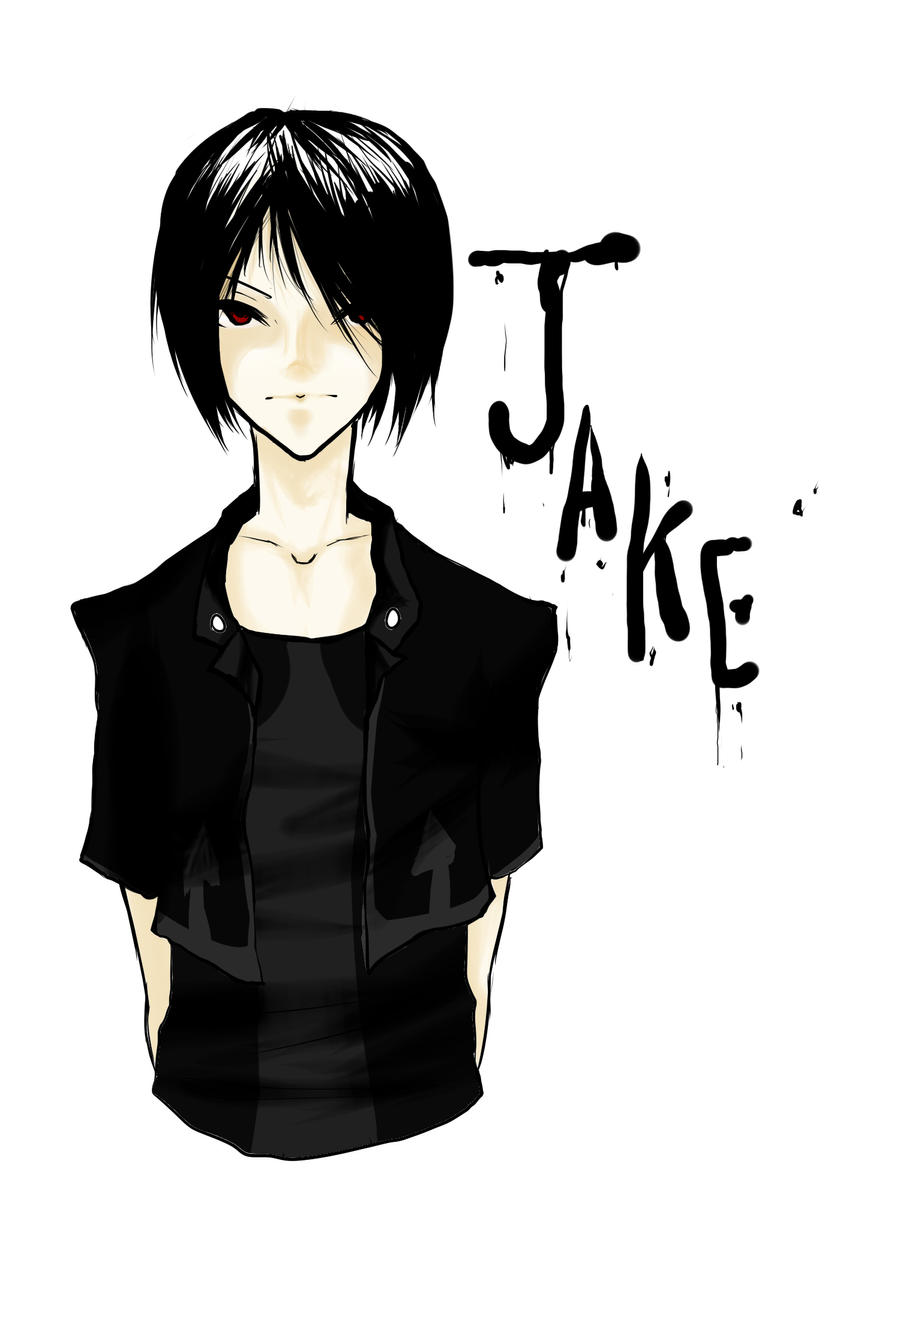 Jake by Haruki-A